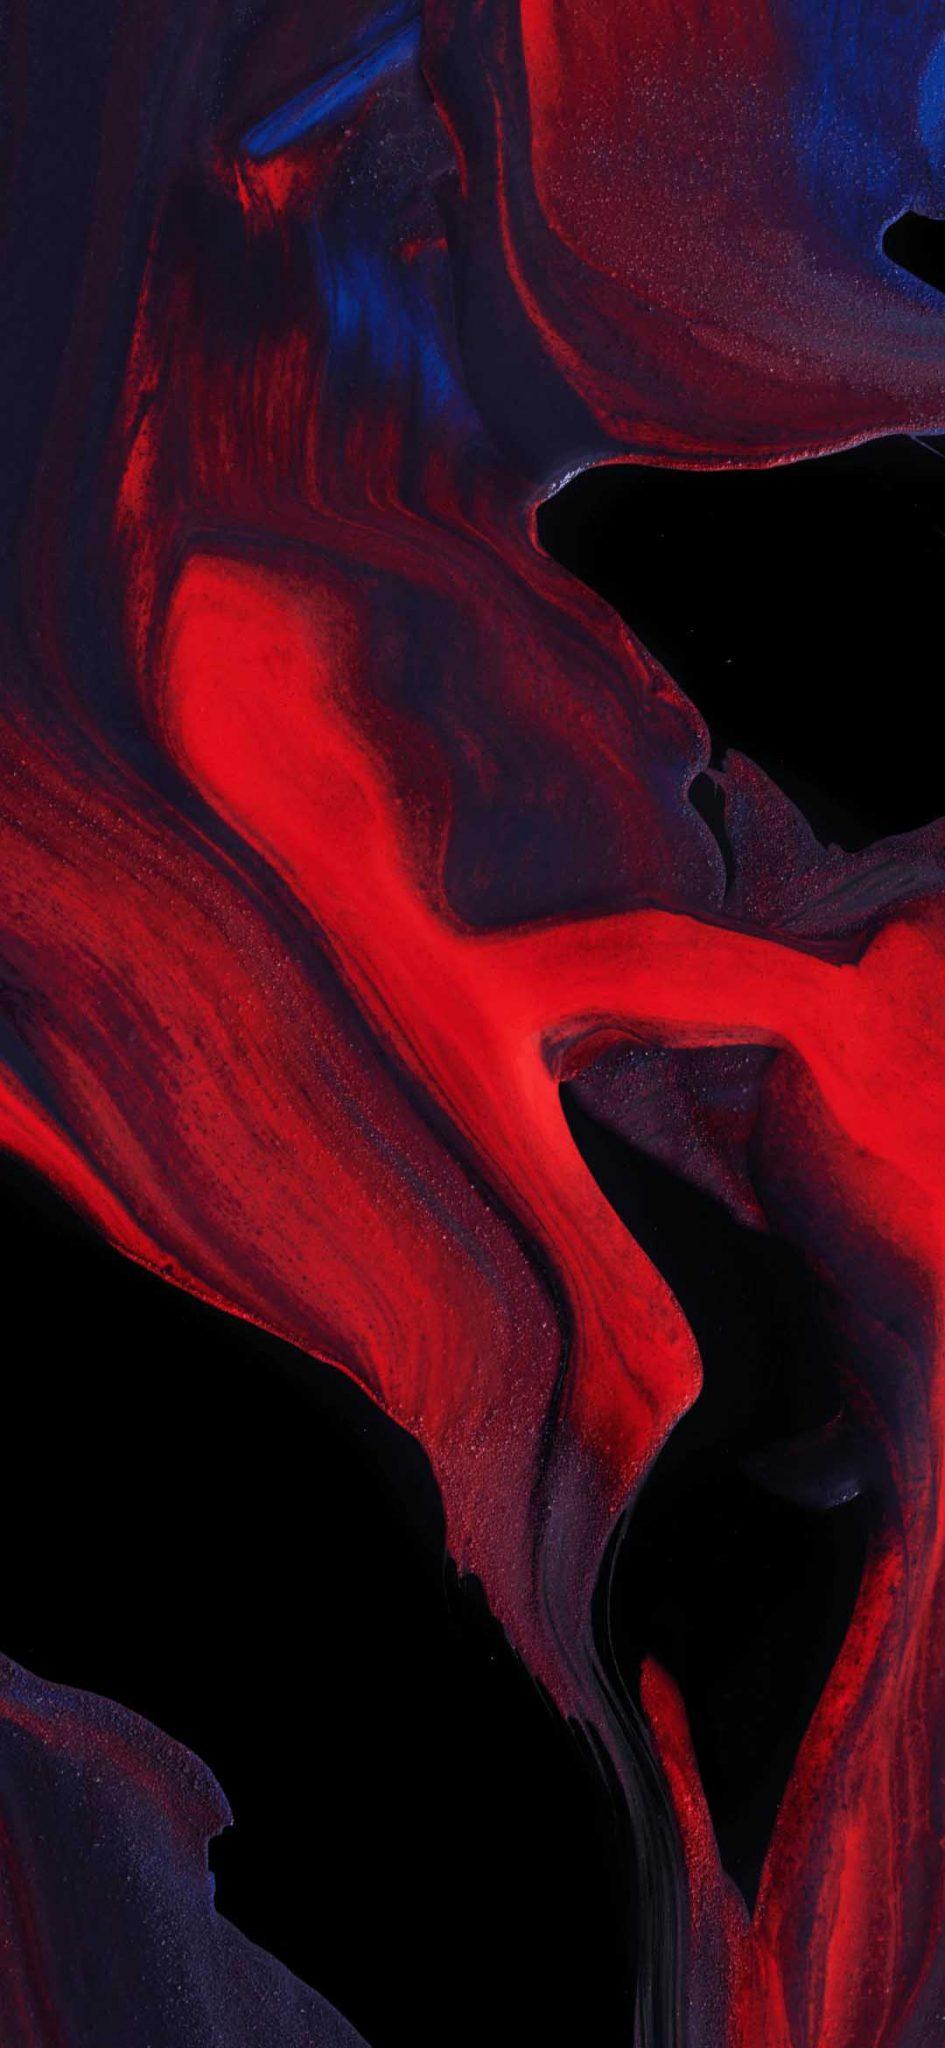 Download Coloros 7 Wallpapers Full Hd Droidviews